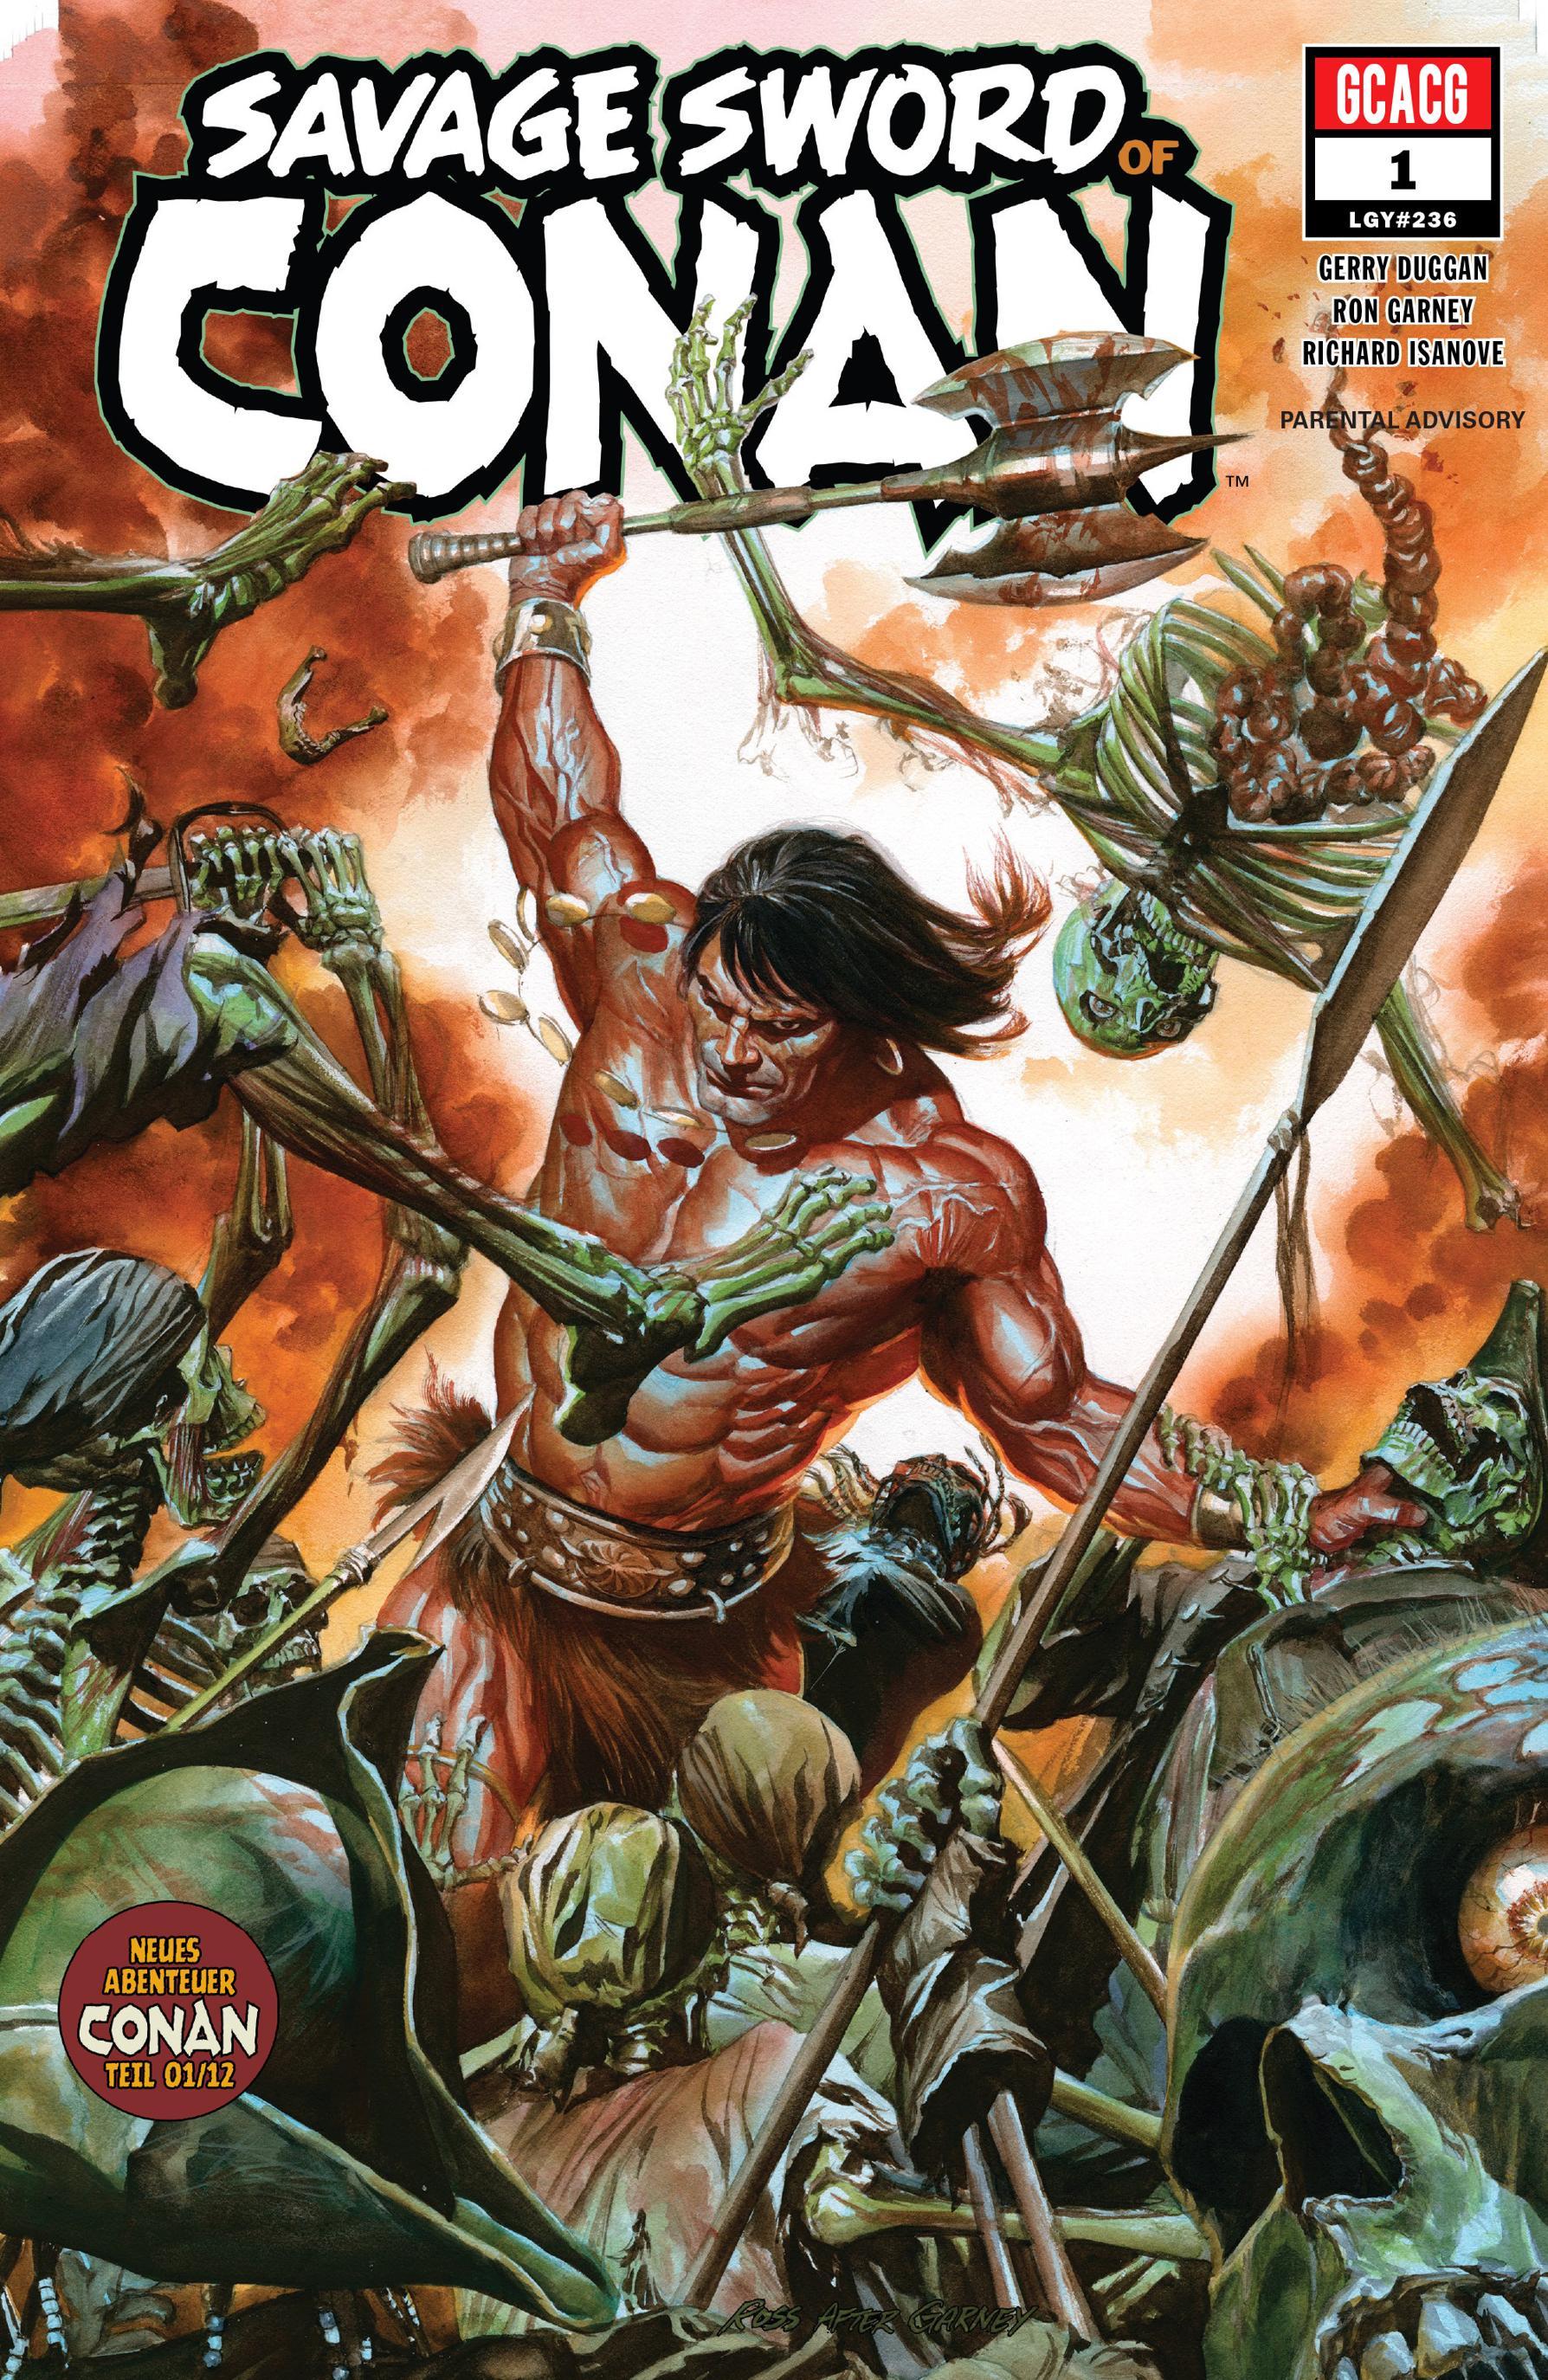 Savage Sword Of Conan 001 - Der Kult des Koga Thun 01 (2019) (Scanlation 736) (2019)